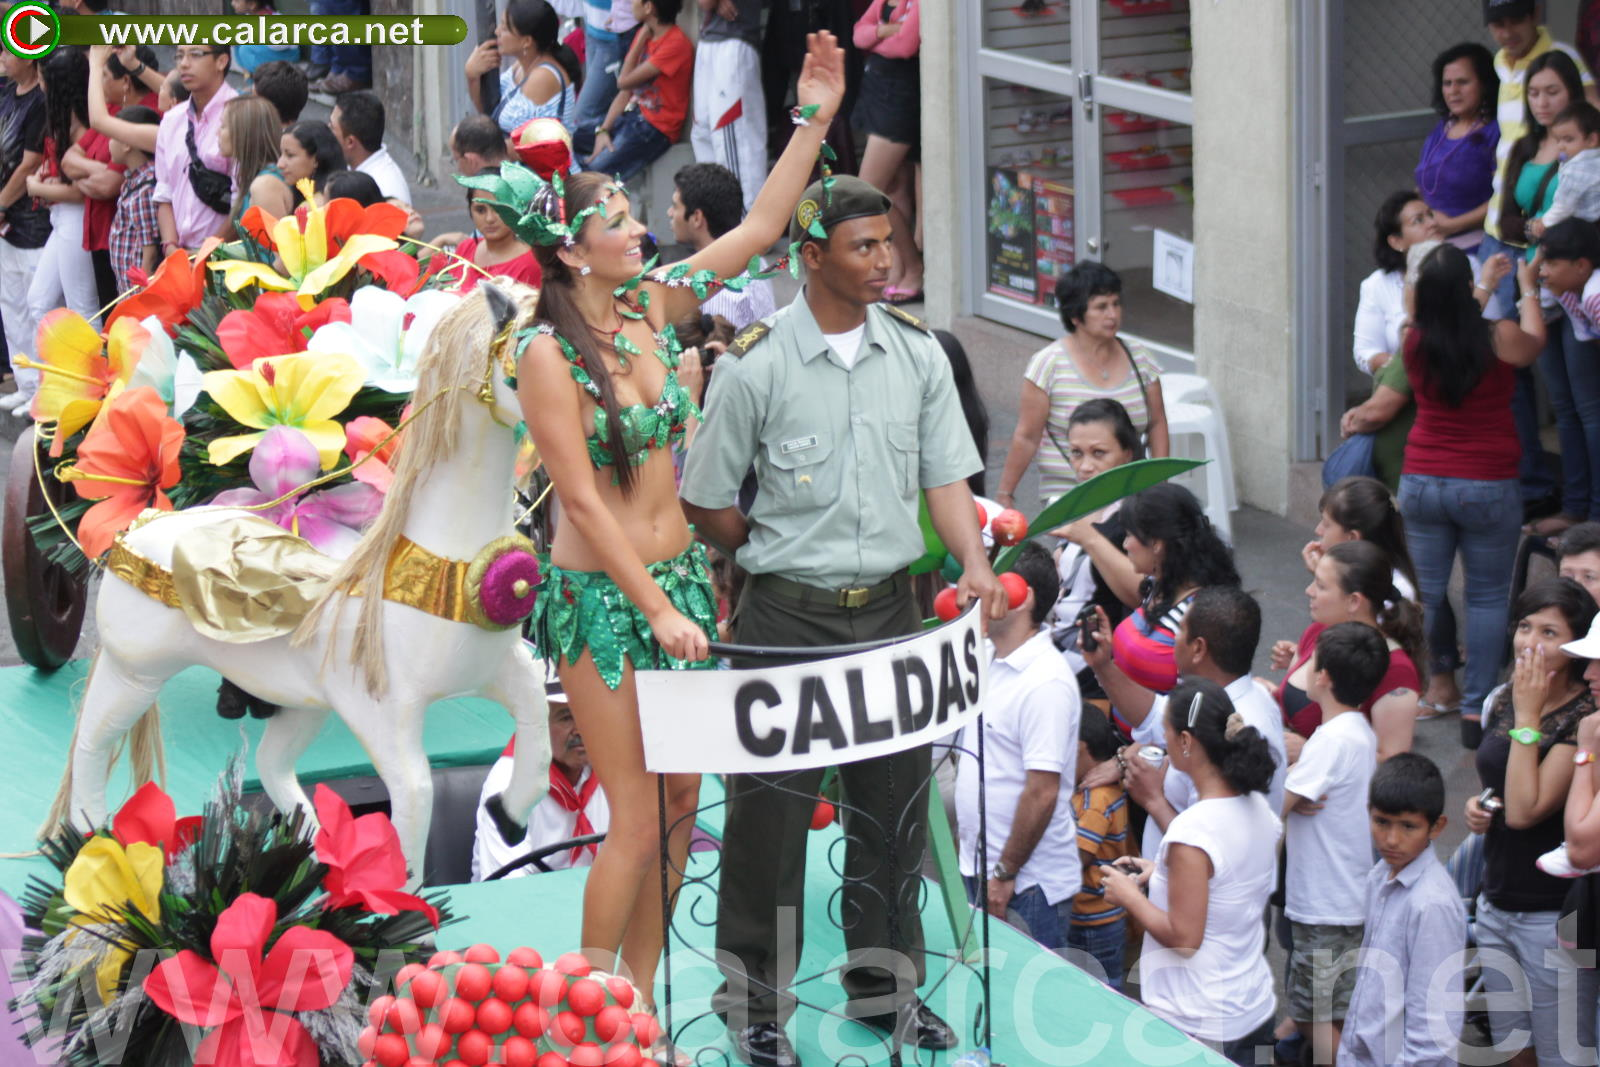 Caldas - Camila Estrada Sánchez